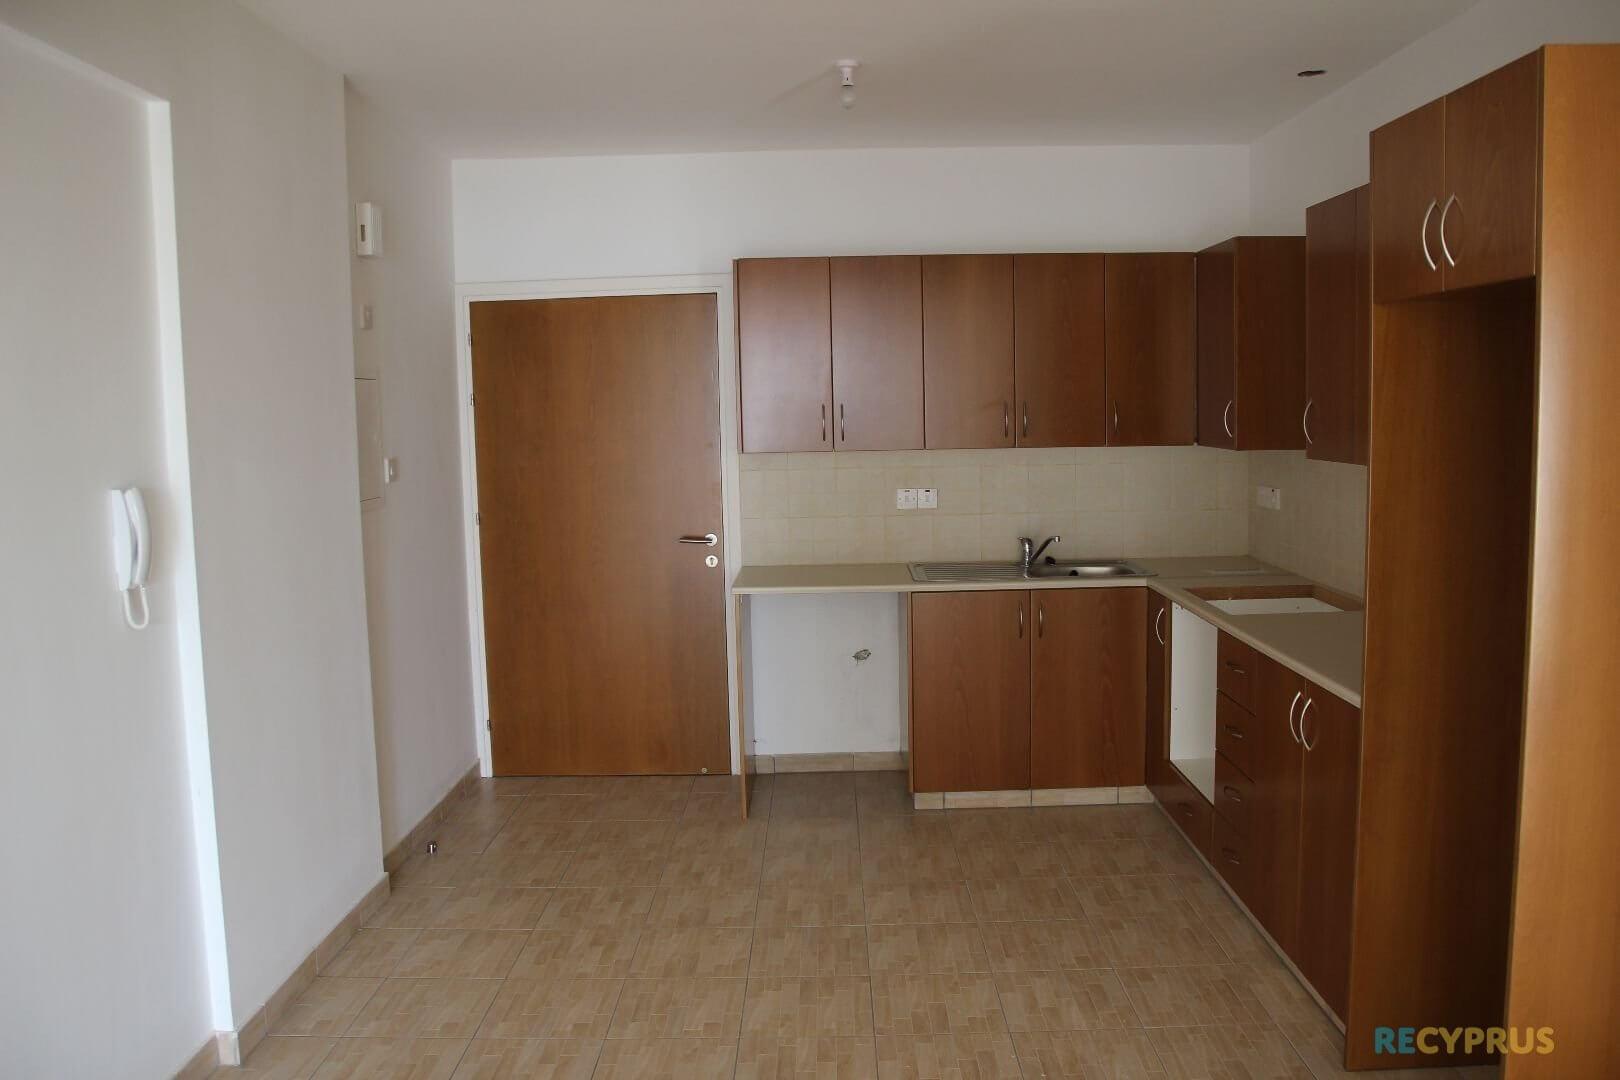 Apartment for sale Kapparis Famagusta Cyprus 3 3519